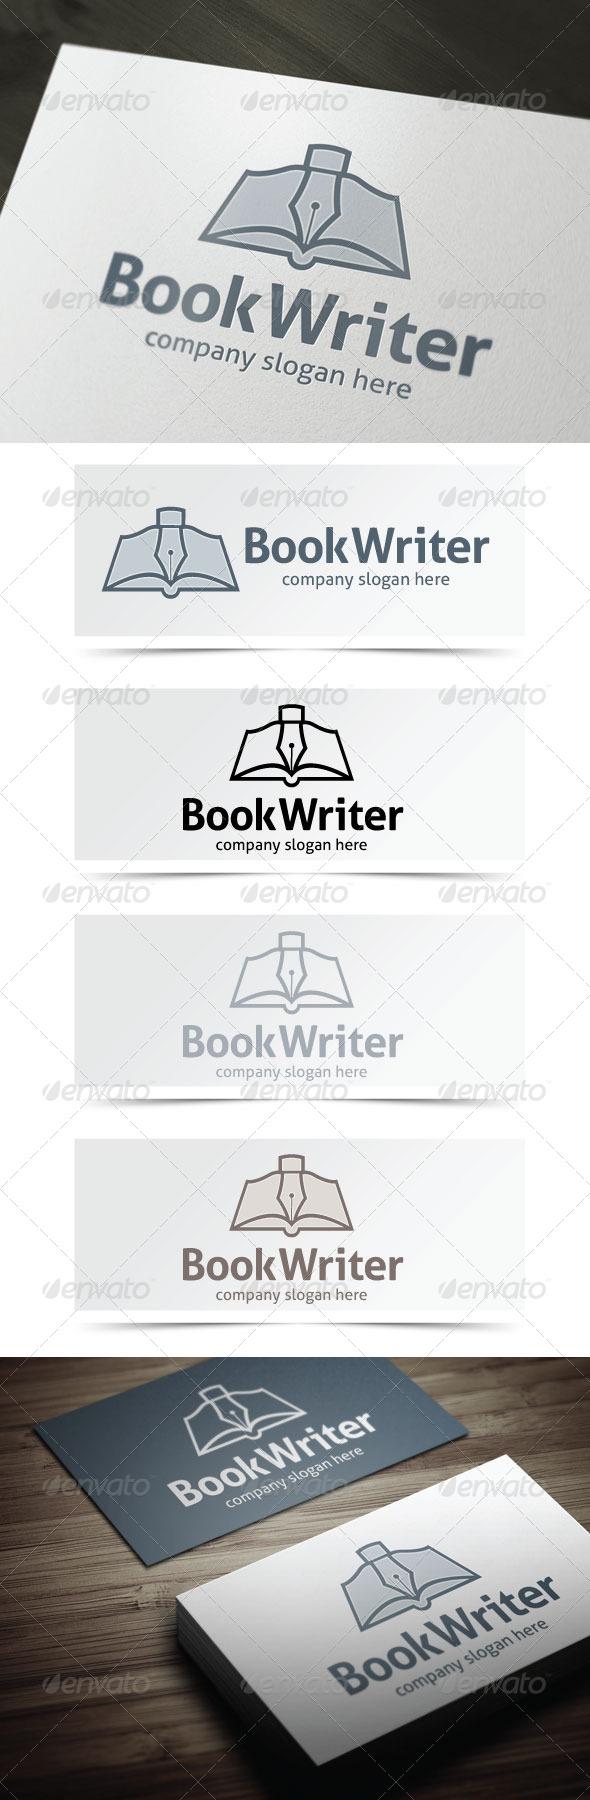 Book Writer